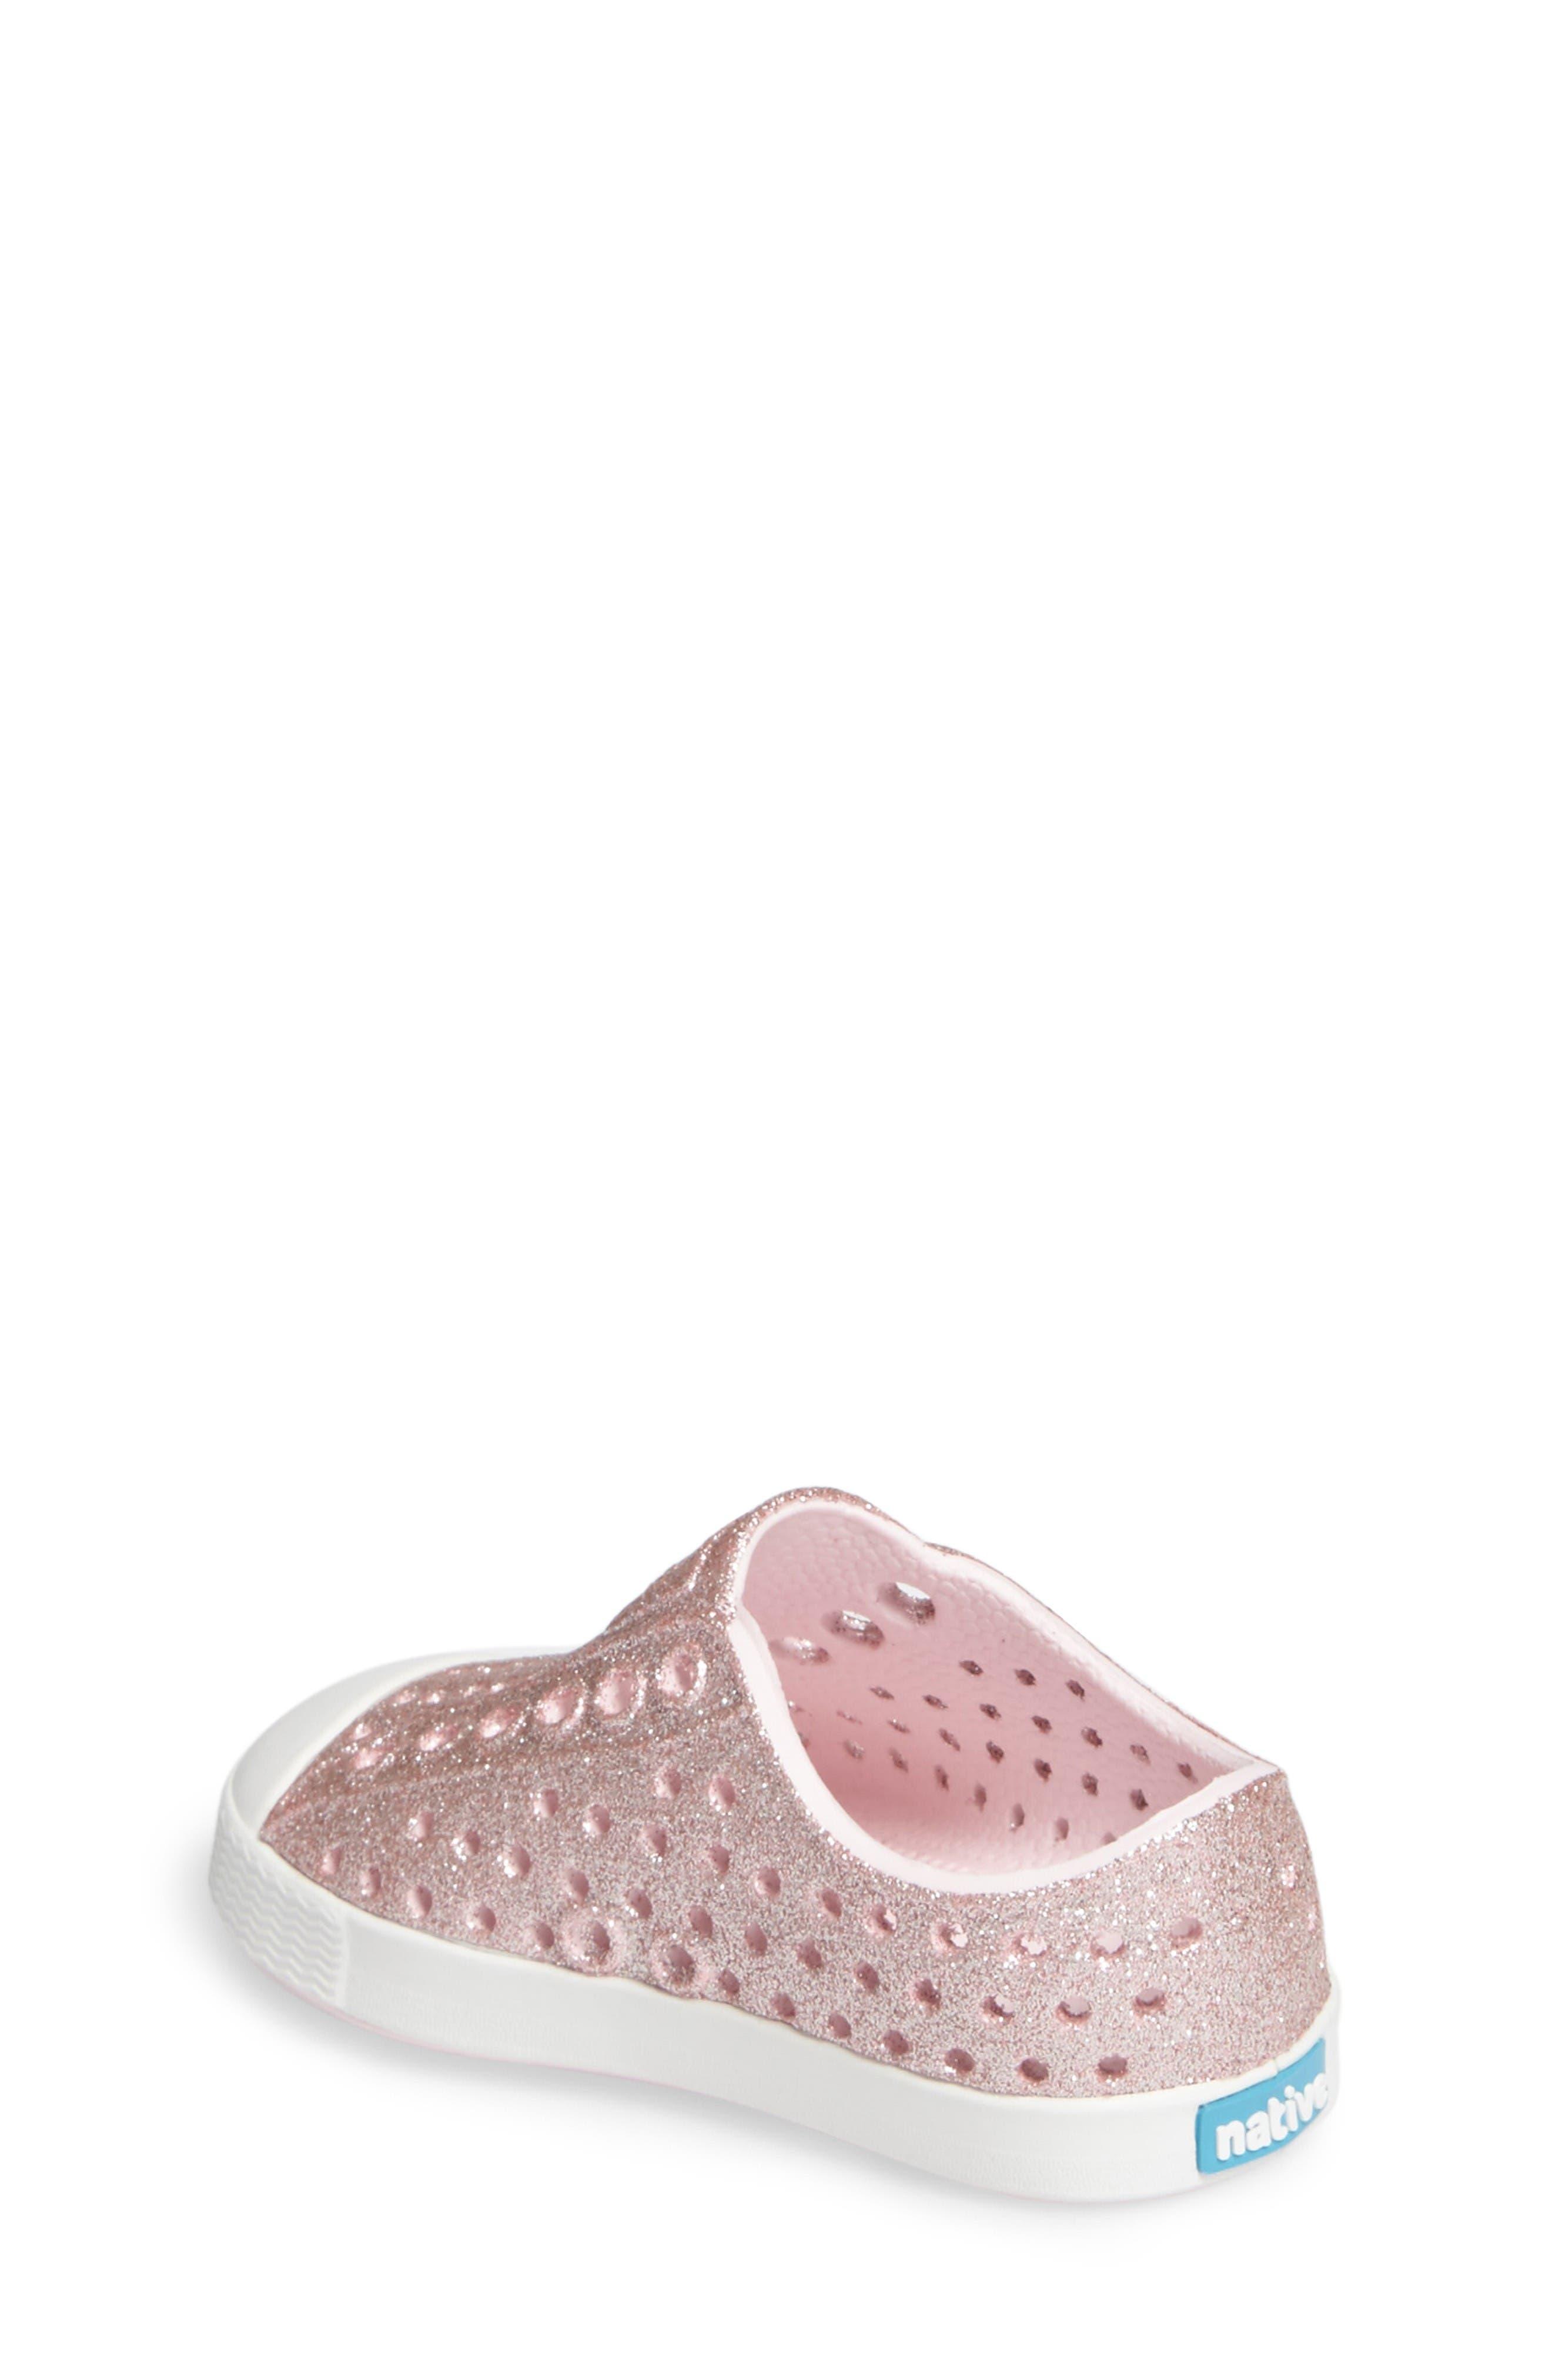 Pink AdidasX AdidasX plr Pink footwear Filleice plr Filleice plr footwear Pink AdidasX Filleice orxBQedCEW